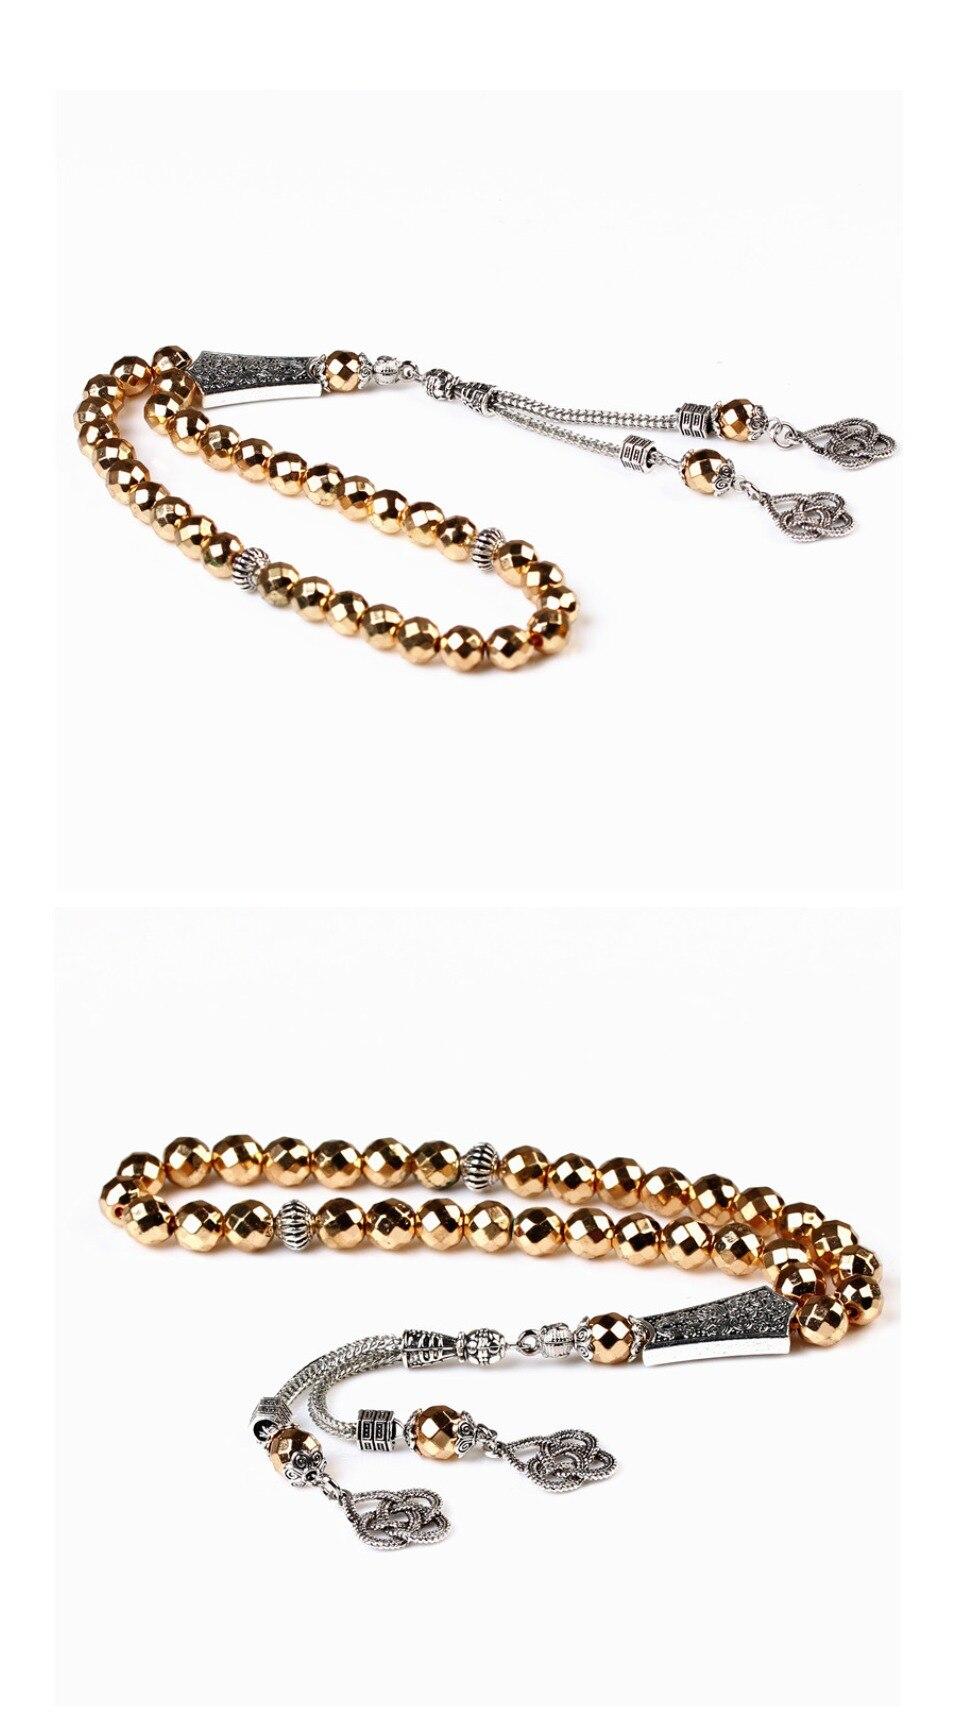 LOSHEREN New Arrival Gold Hematite Stone 33 Prayer beads Islamic Muslim Tasbih Rosary Misbaha bead for Famliy Friend Bracelets